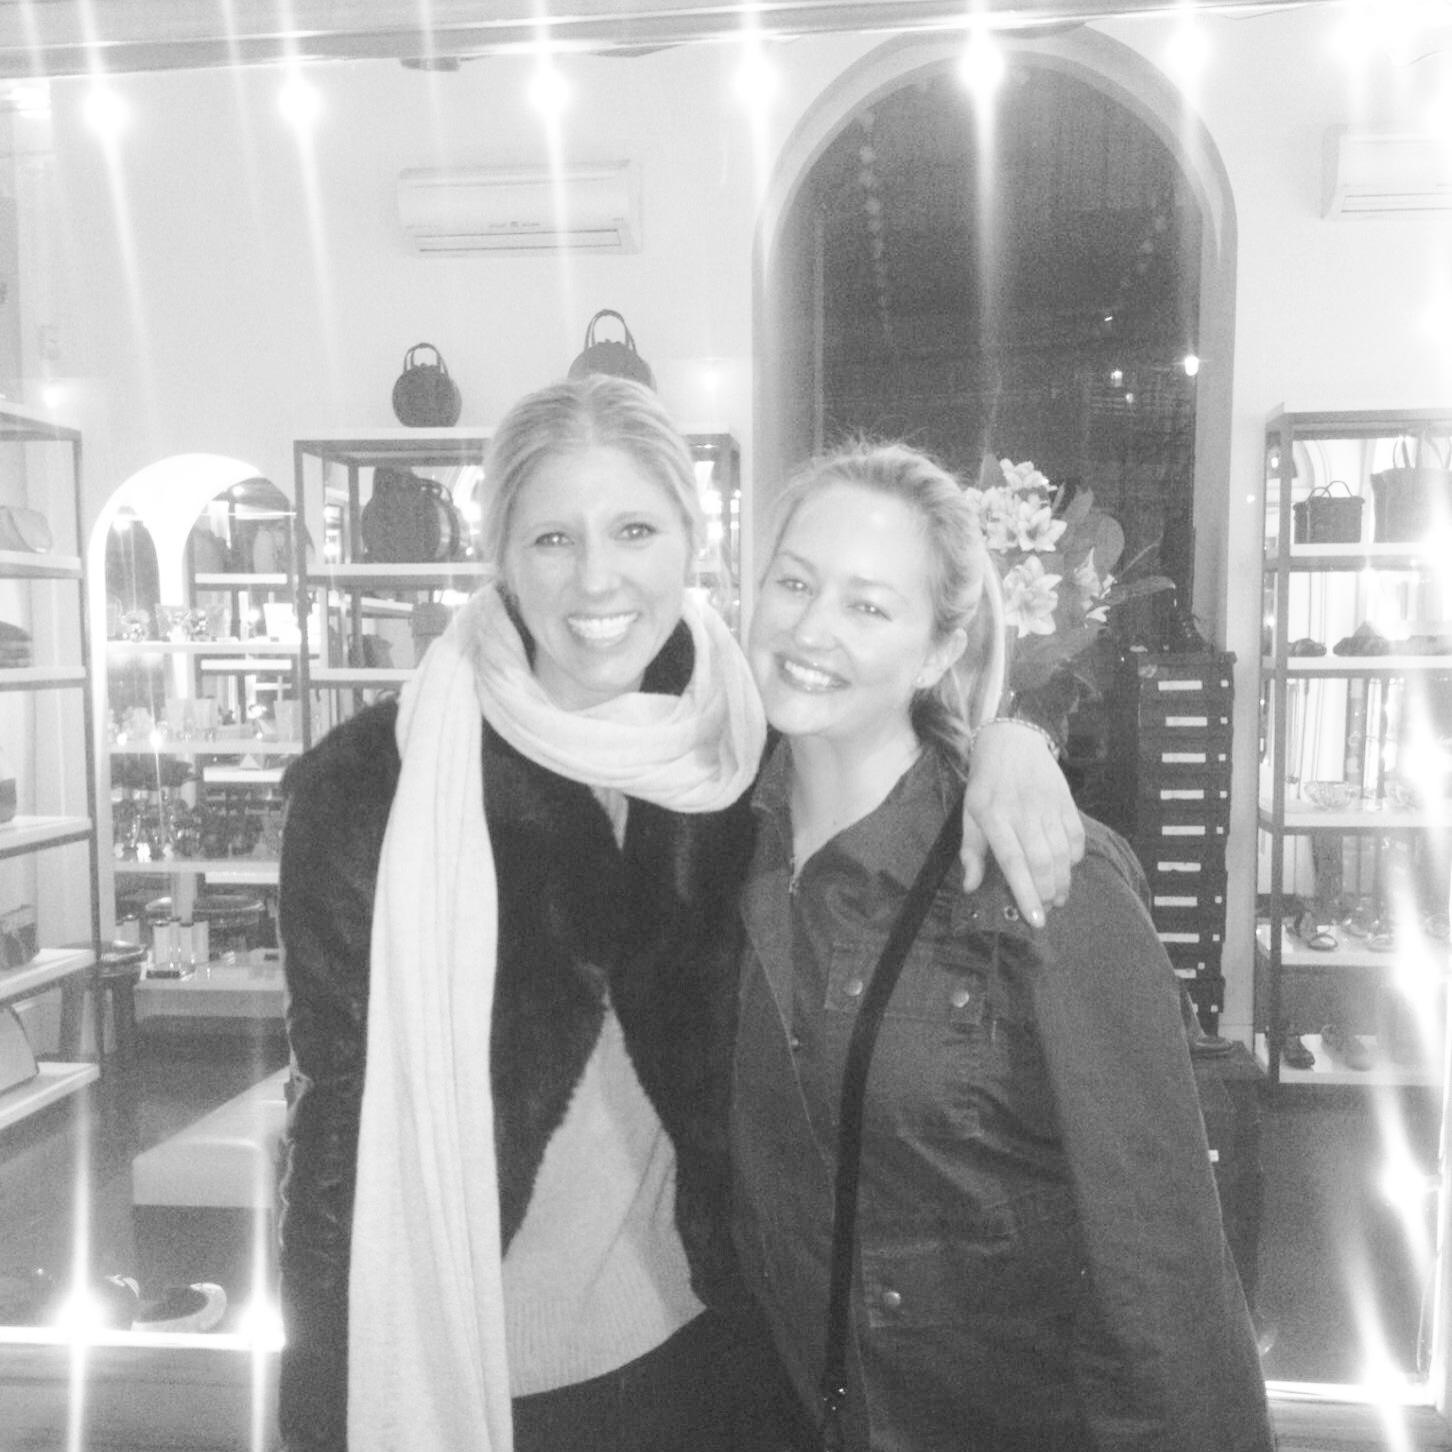 Mimi & me December 2013